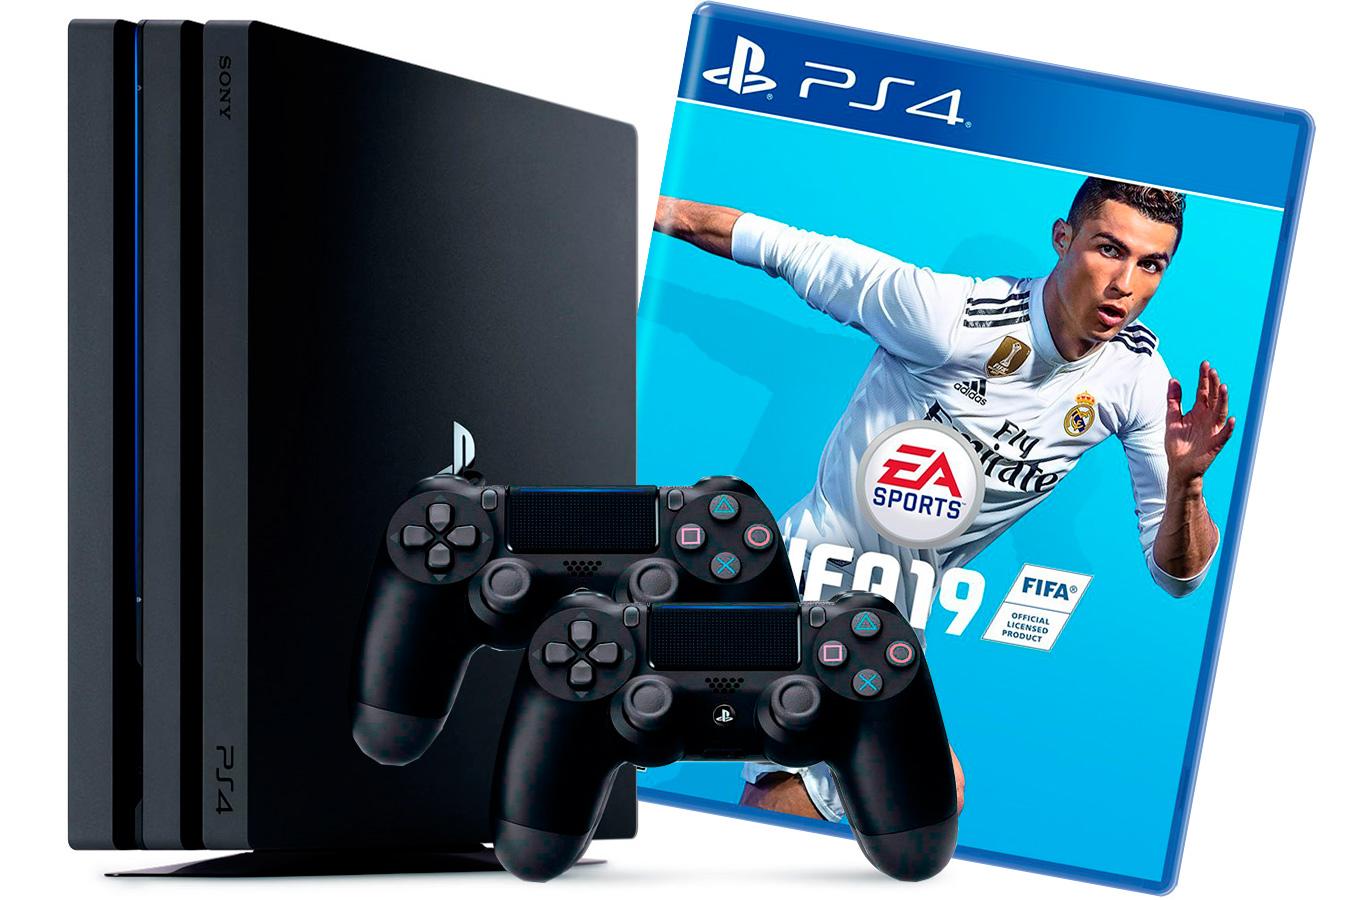 PlayStation 4 Pro 2 джойстика, приставка и игра FIFA 19 [PS4P1J2F19]